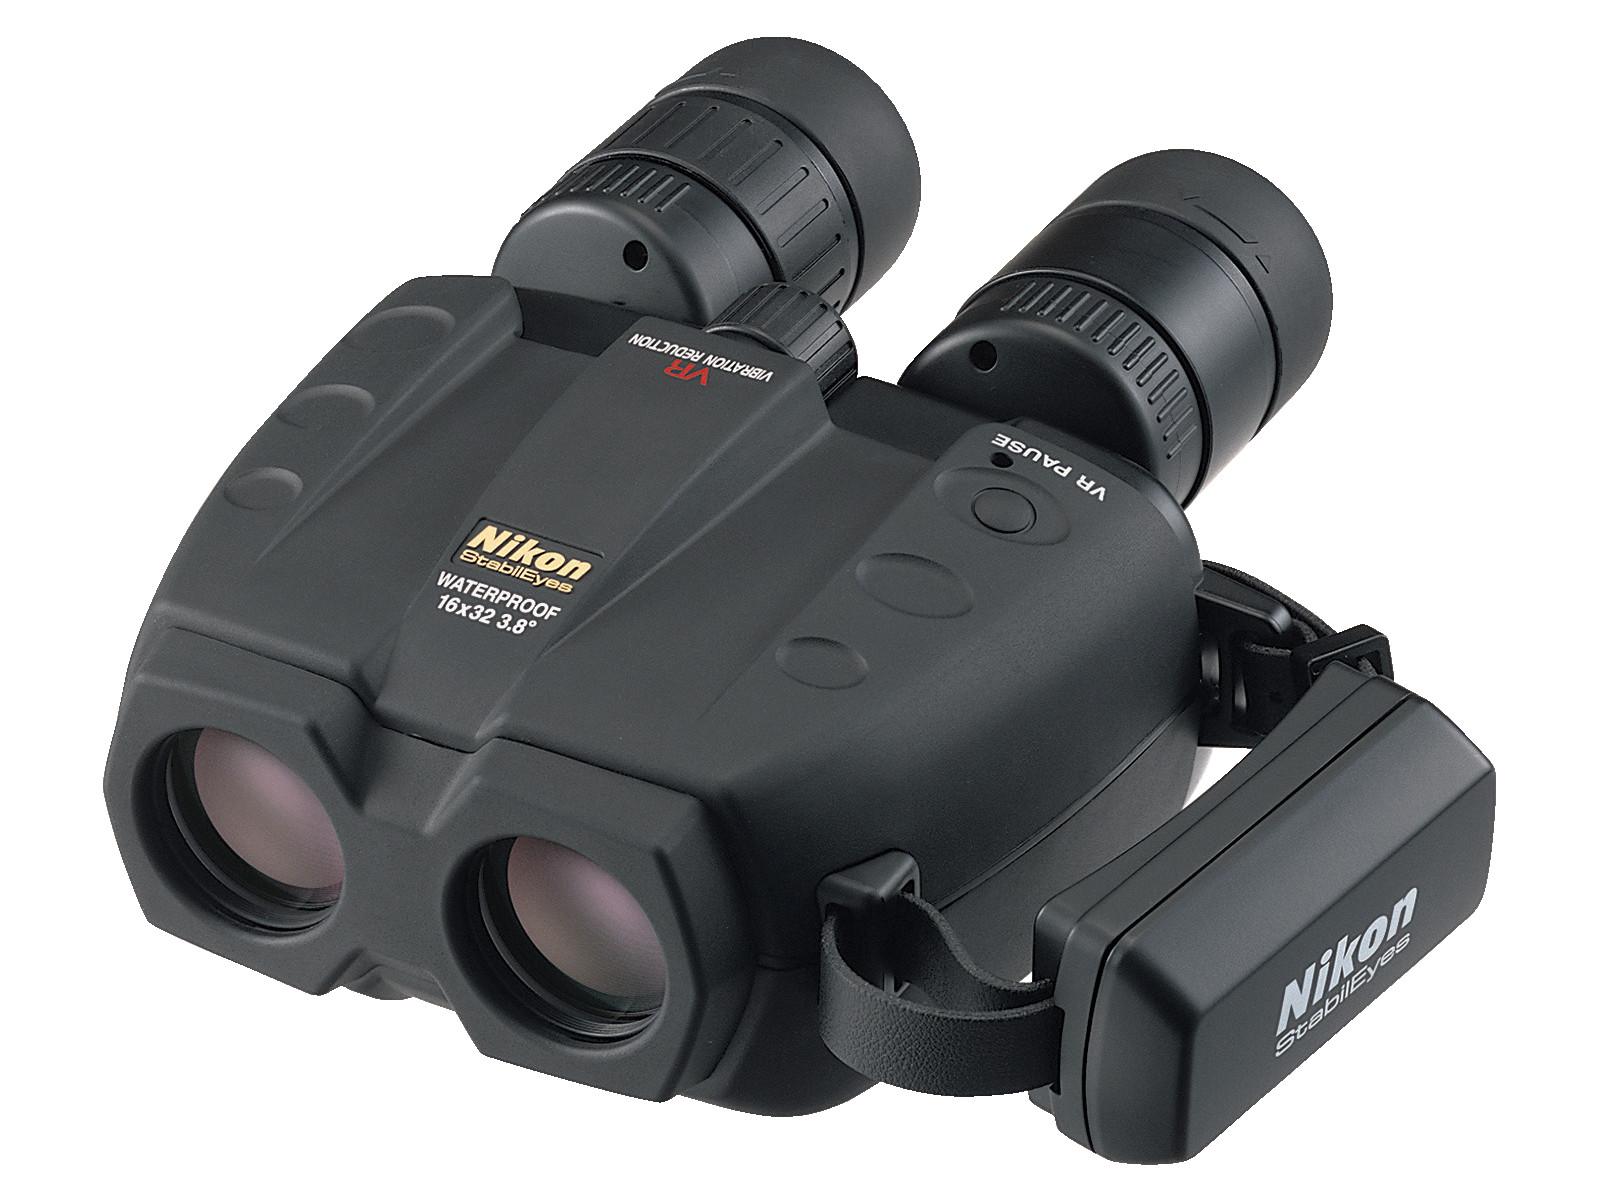 StabilEyes 16X32 避震型望遠鏡 雙筒望遠鏡/單眼鏡-登山賞鳥